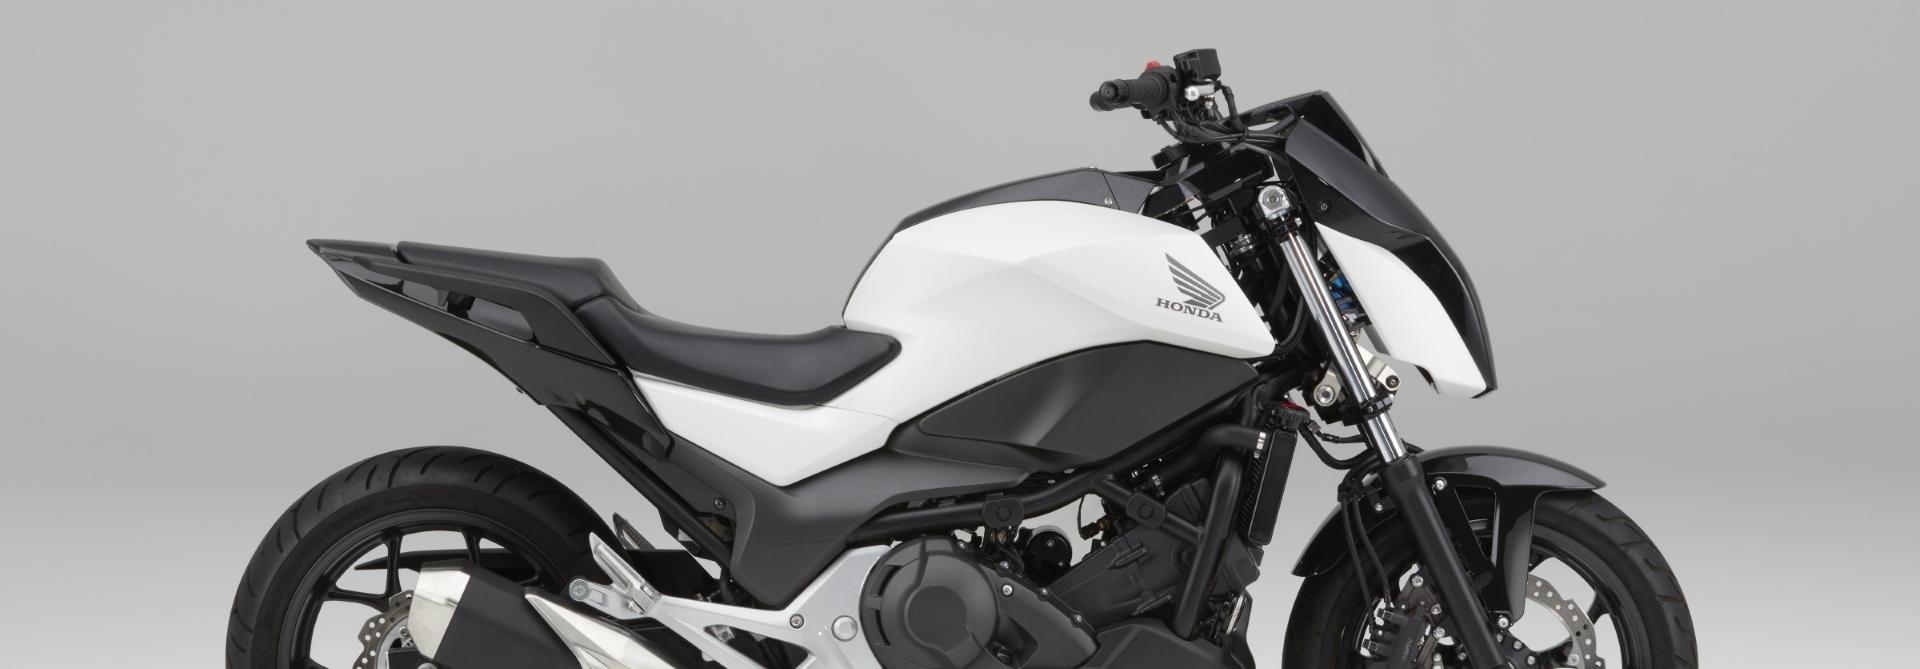 FOTO: Honda Self Balancing Motorcycle: Pad više nije opcija